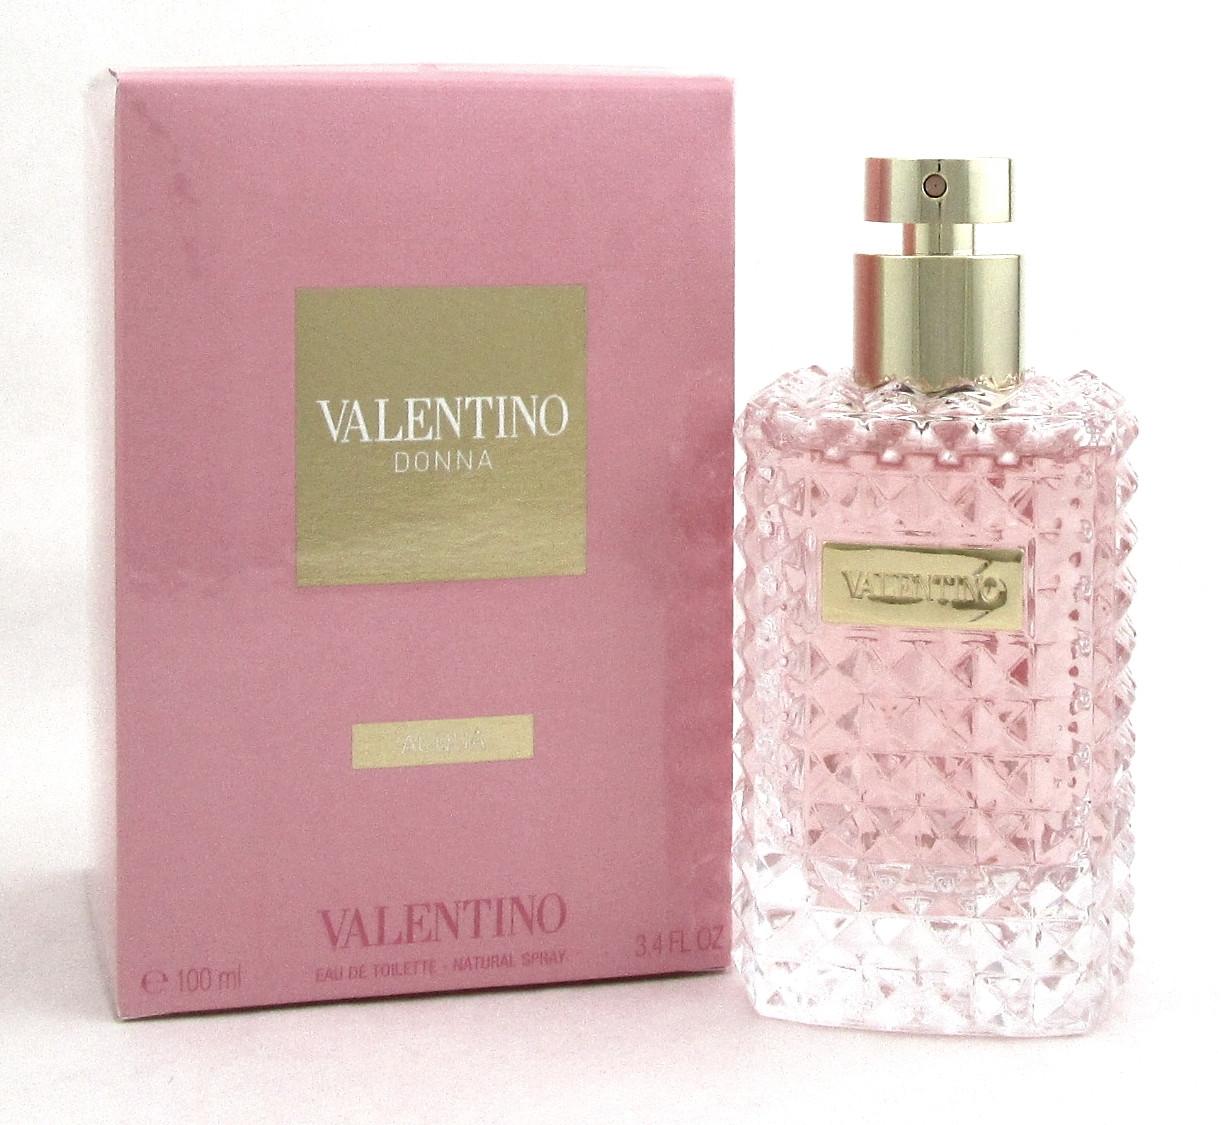 NewSealed Valentino WomenBrand Donna 4 Box 3 Spray OzEdt For Acqua Perfume EID9YWH2